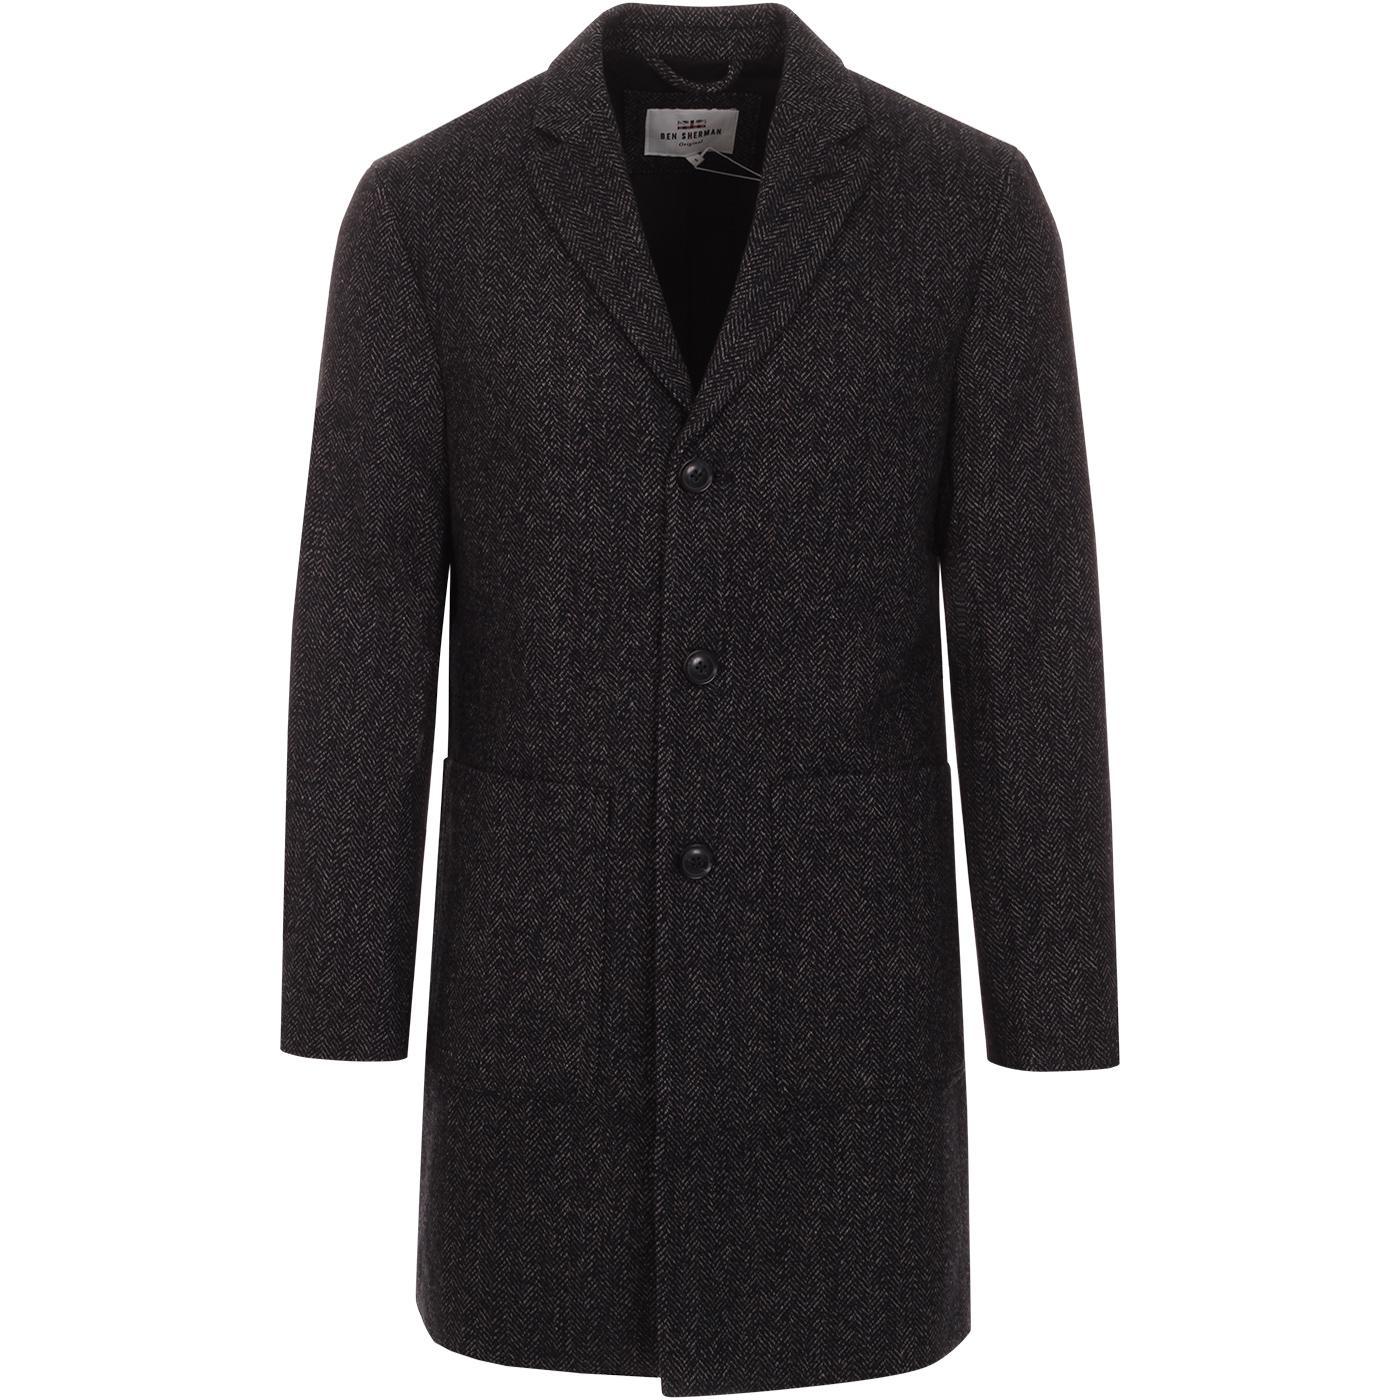 BEN SHERMAN Retro Mod Herringbone Overcoat (C)